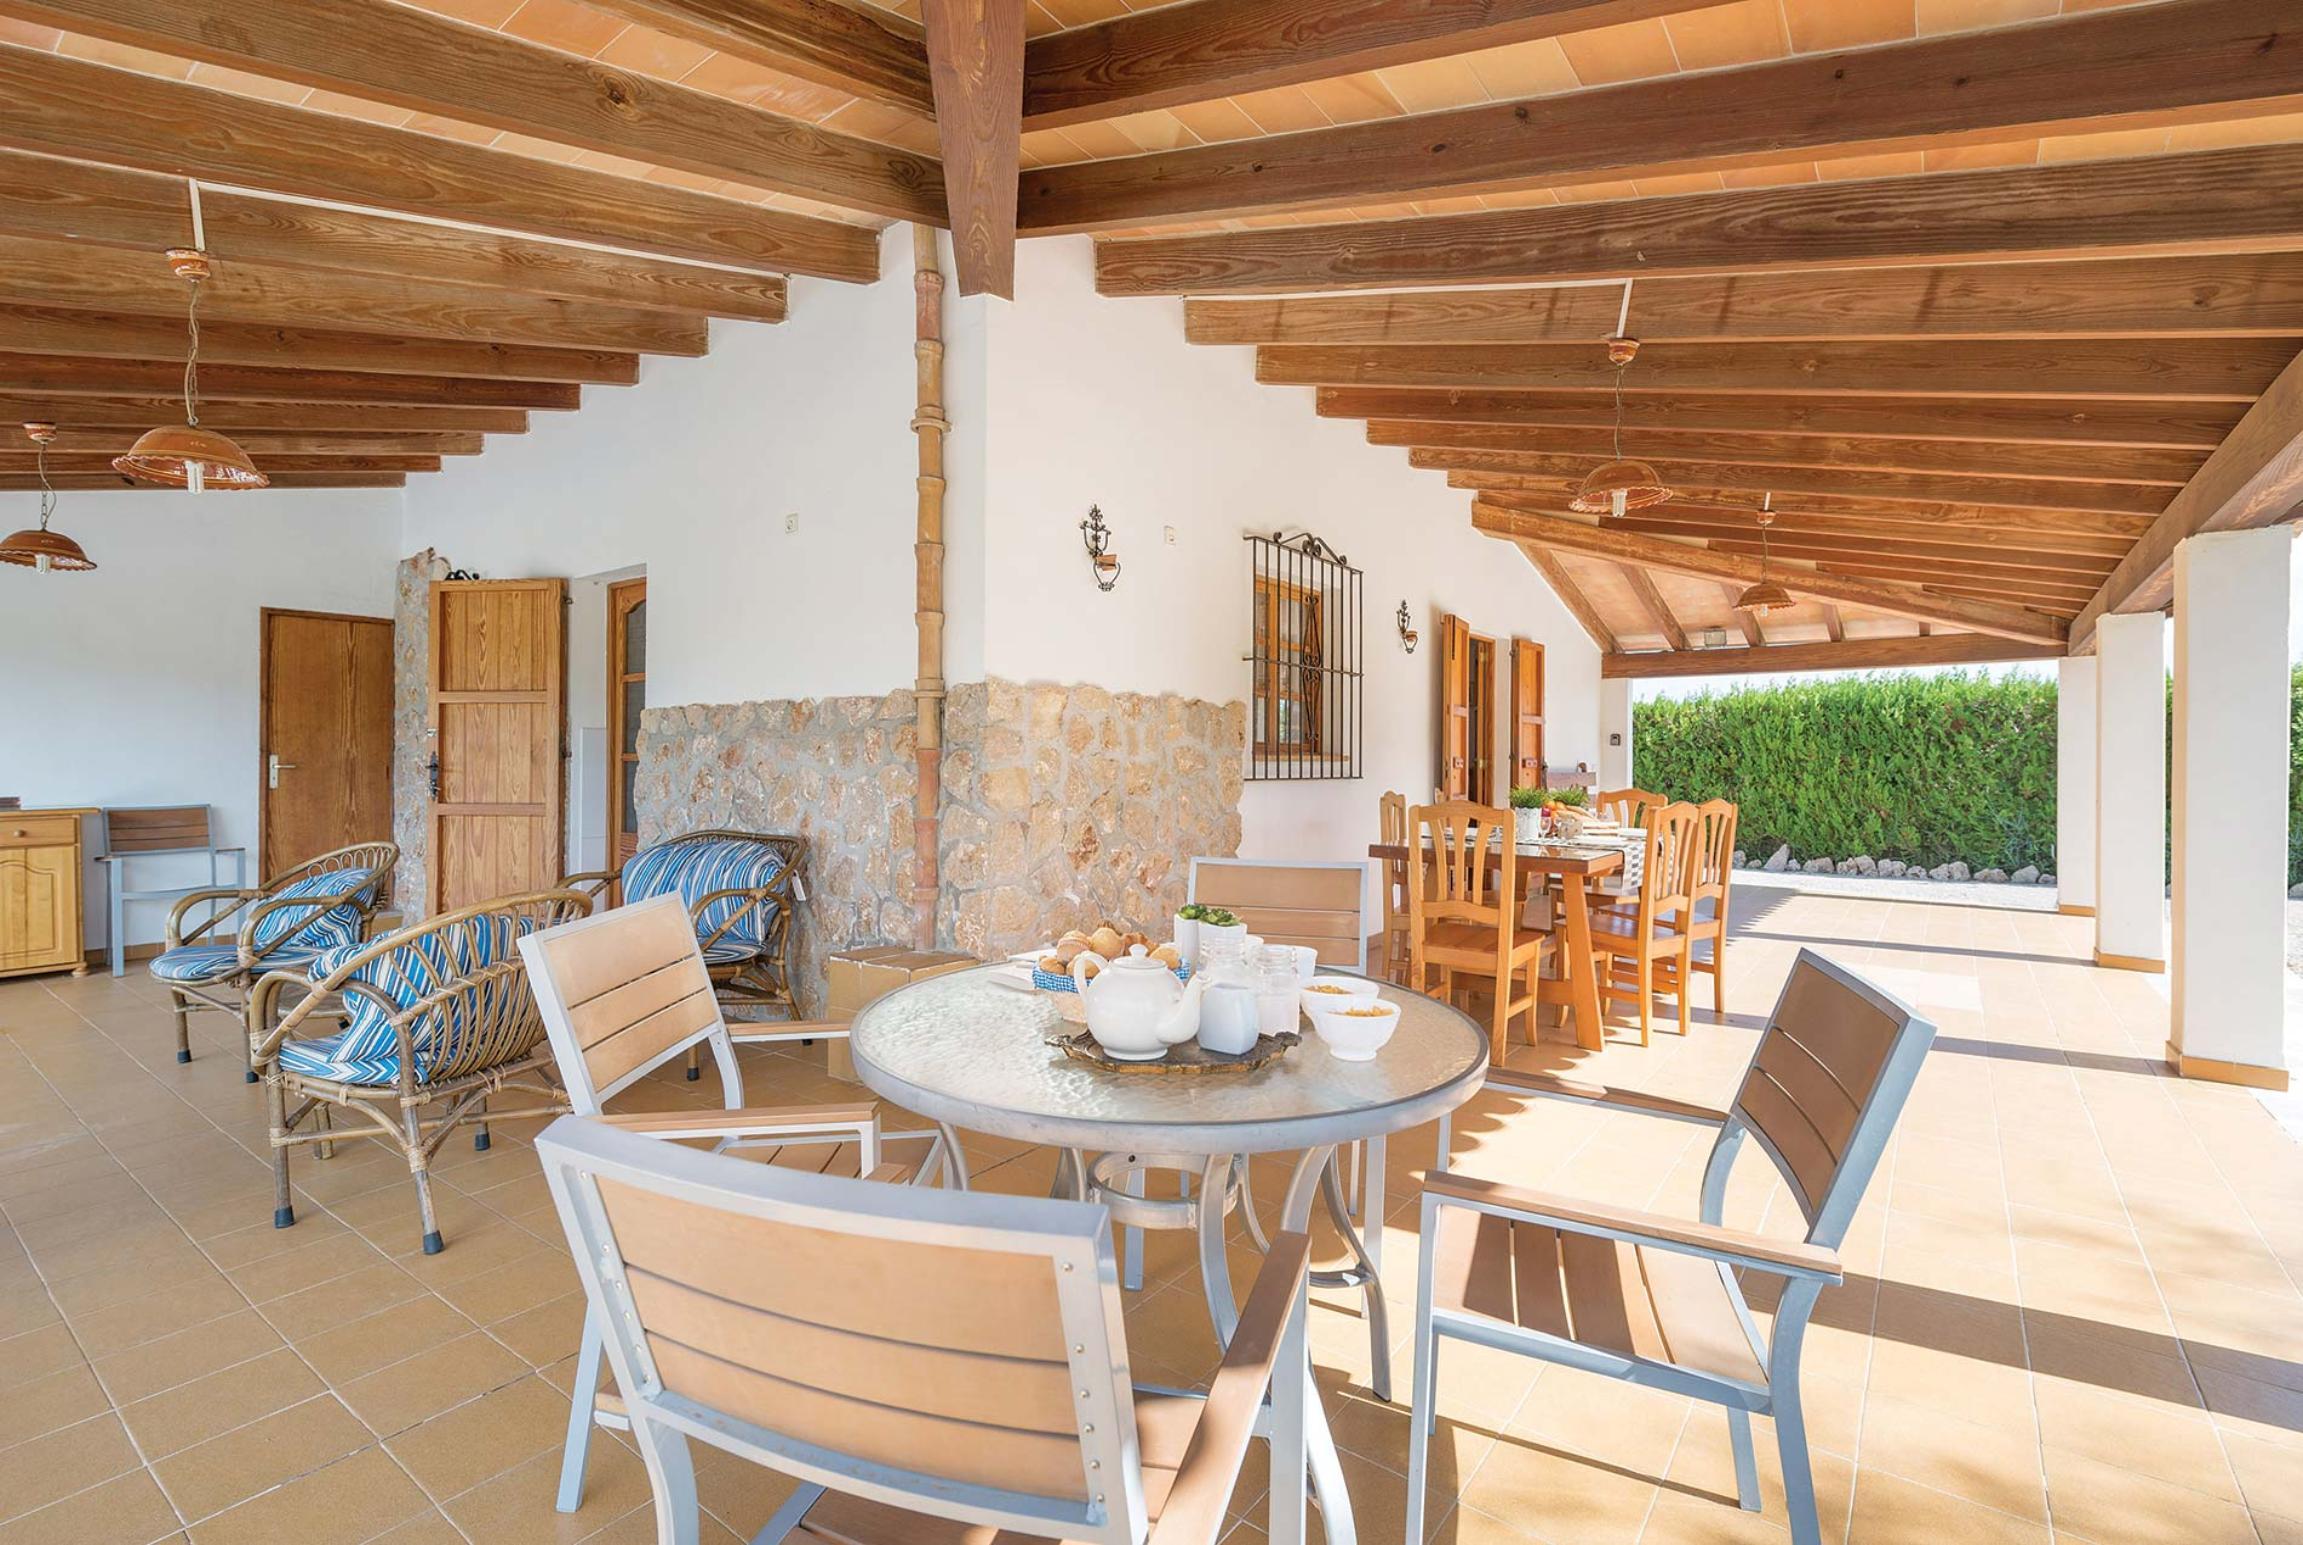 Ferienhaus Rasca (2654350), Formentor, Mallorca, Balearische Inseln, Spanien, Bild 7